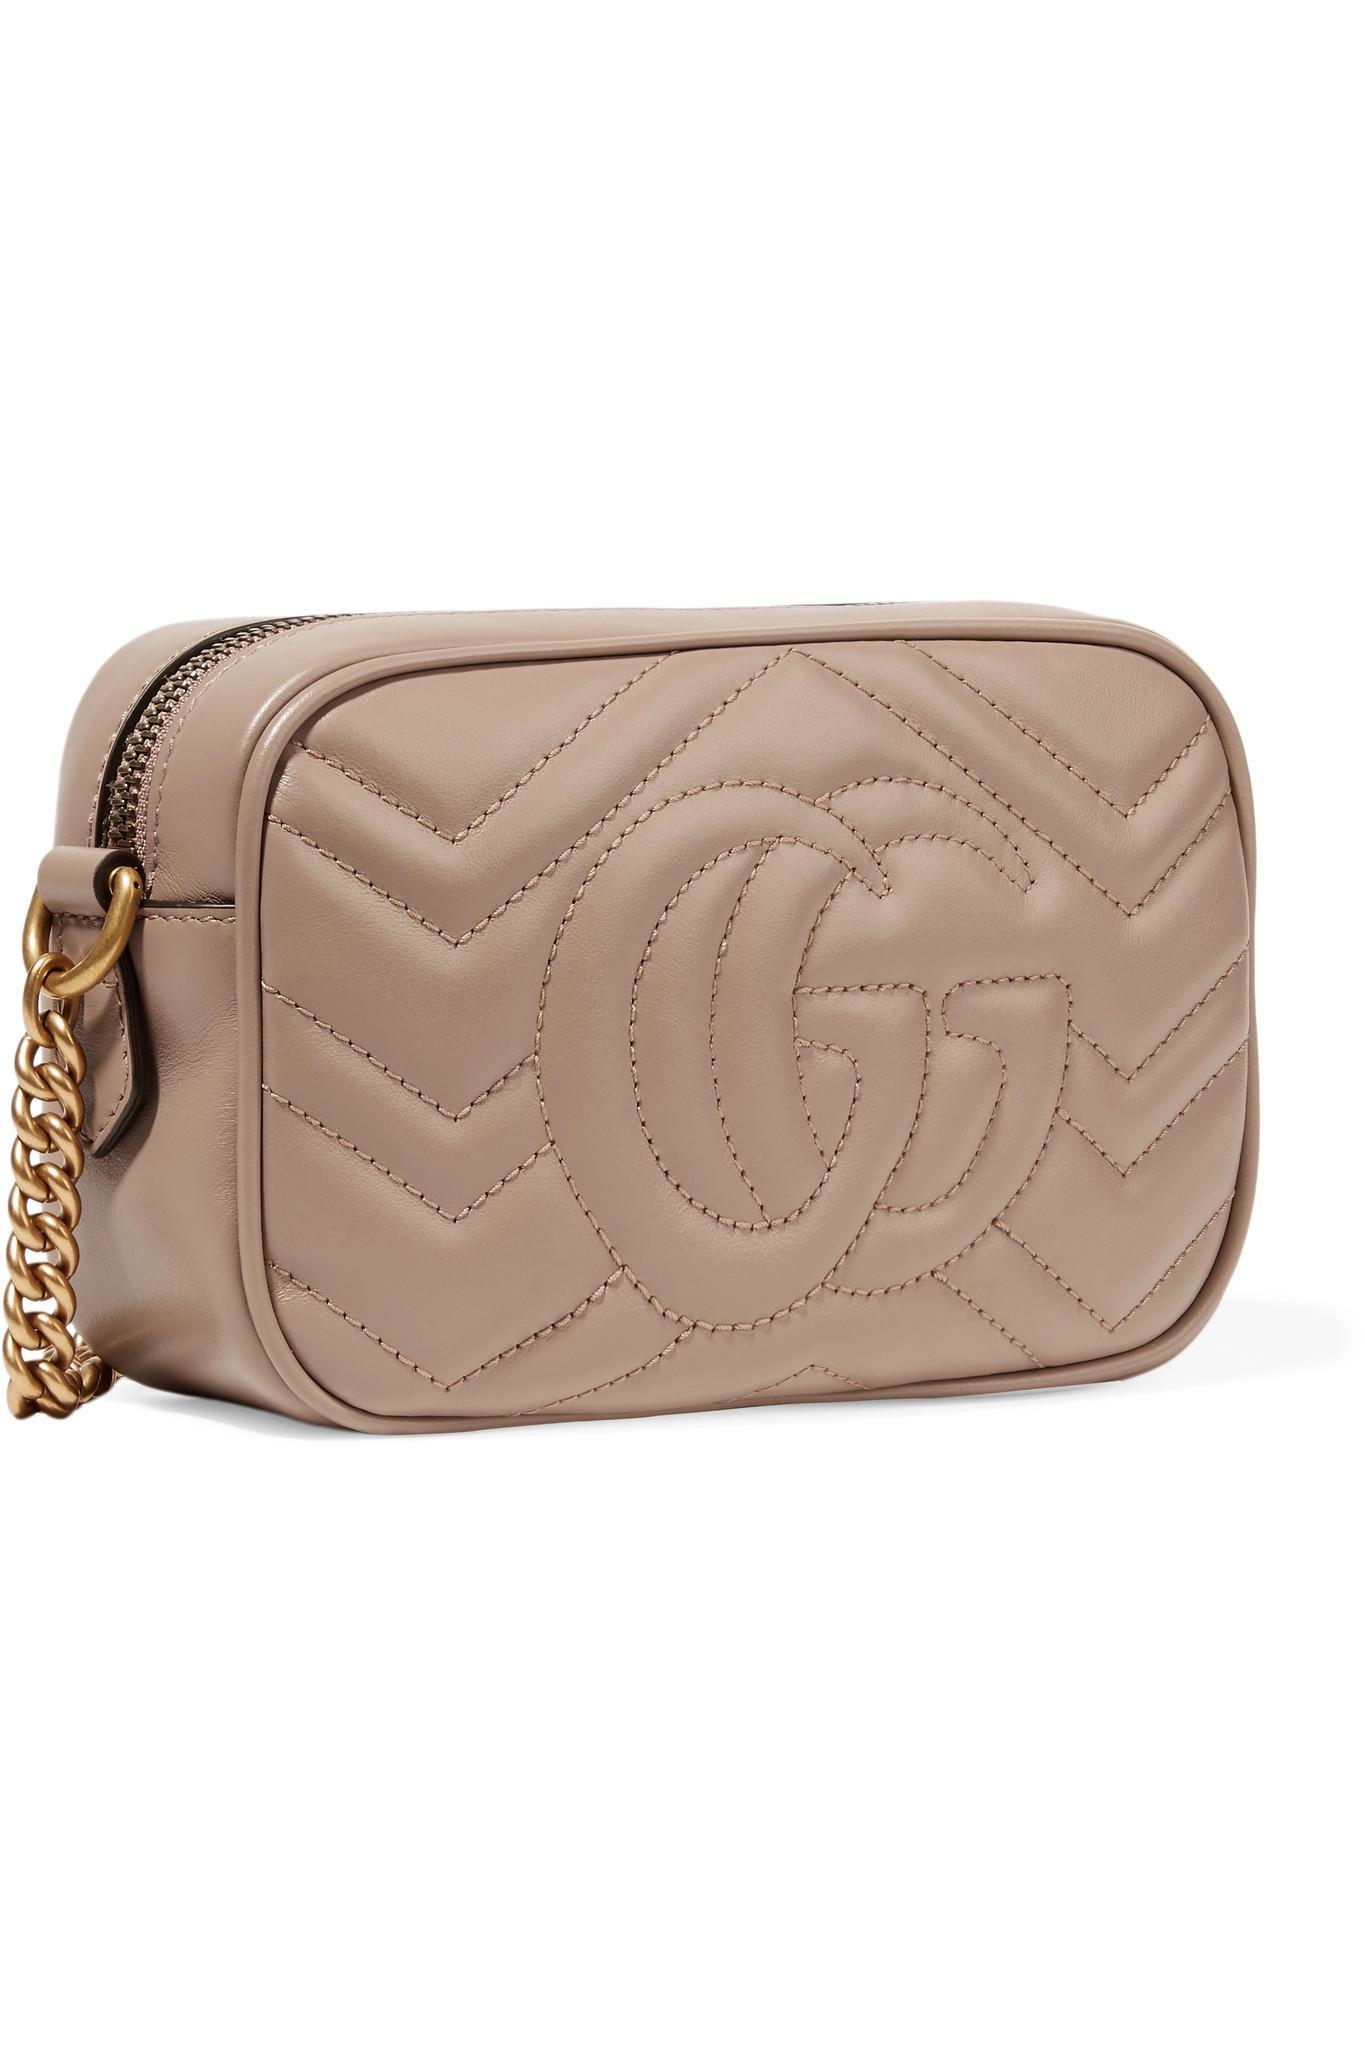 5cdfd9f2523e Gucci - Multicolor Gg Marmont Camera Mini Quilted Leather Shoulder Bag -  Lyst. View fullscreen